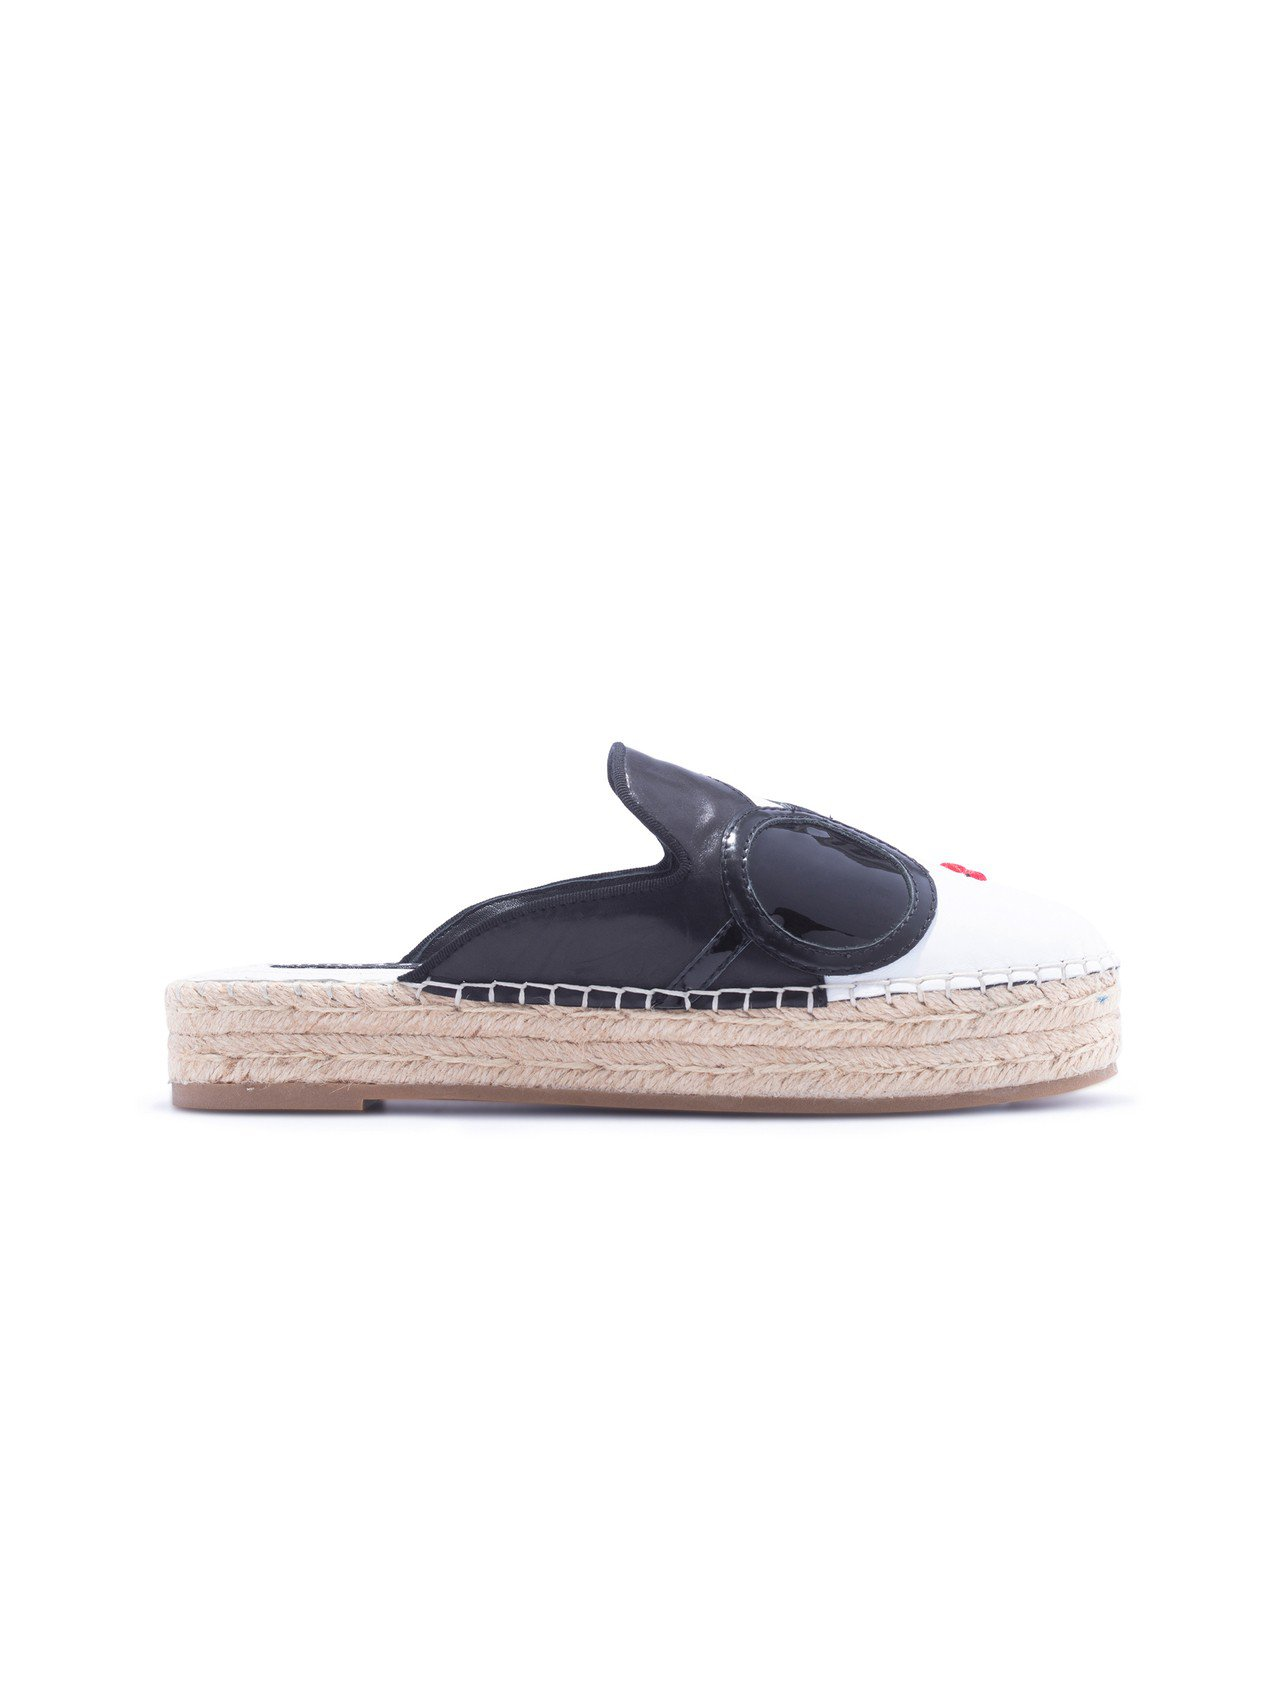 StaceFace皮革厚底拖鞋,12,900元。圖/Alice+Olivia提供